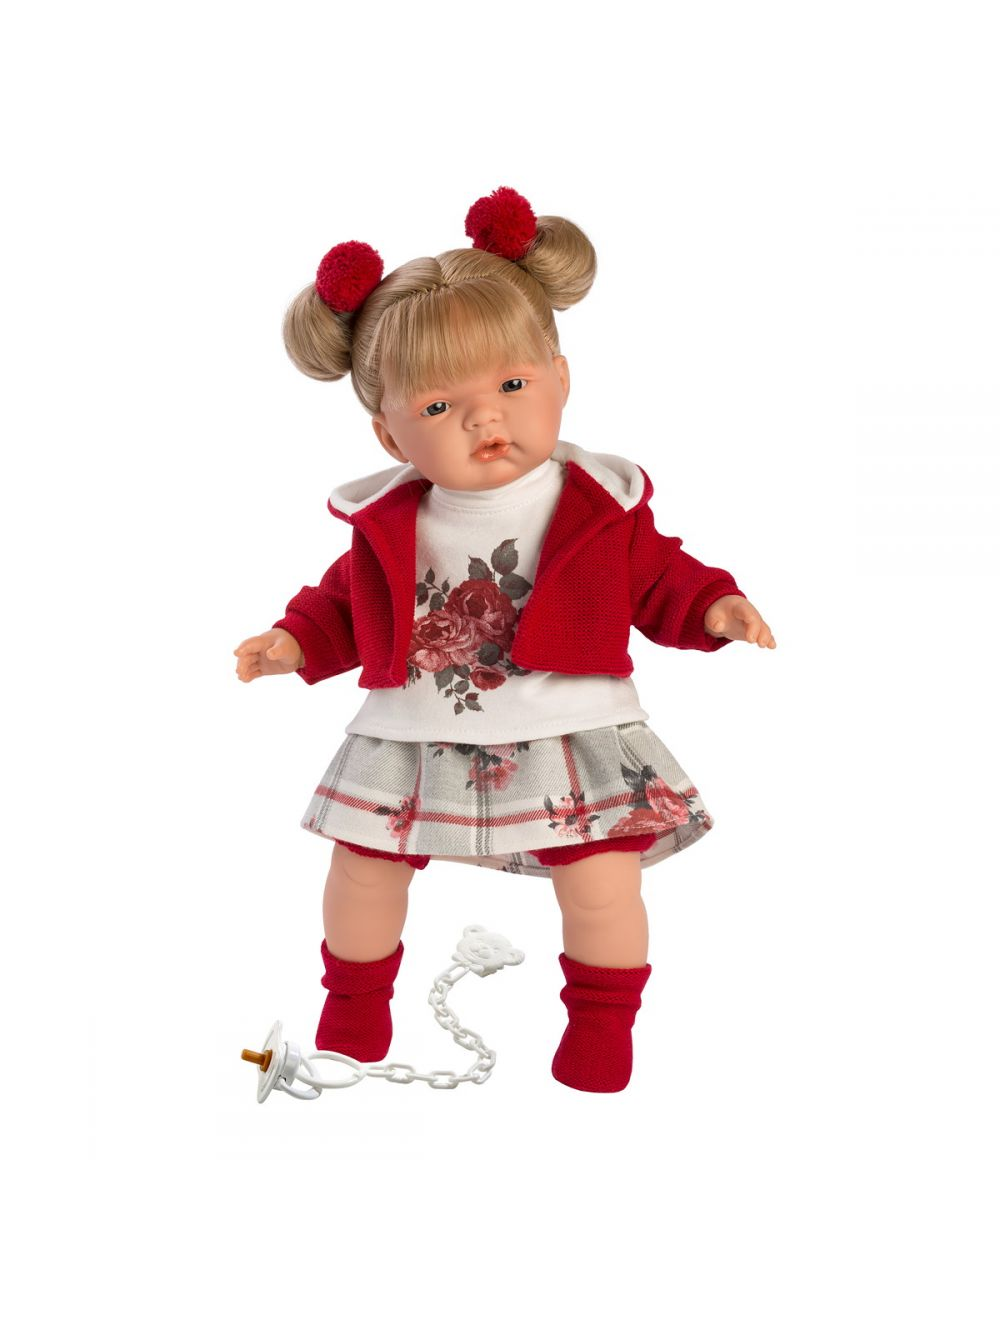 Llorens 38556 Lalka płacząca Joelle blondynka 38 cm czerowna bluza i gumki